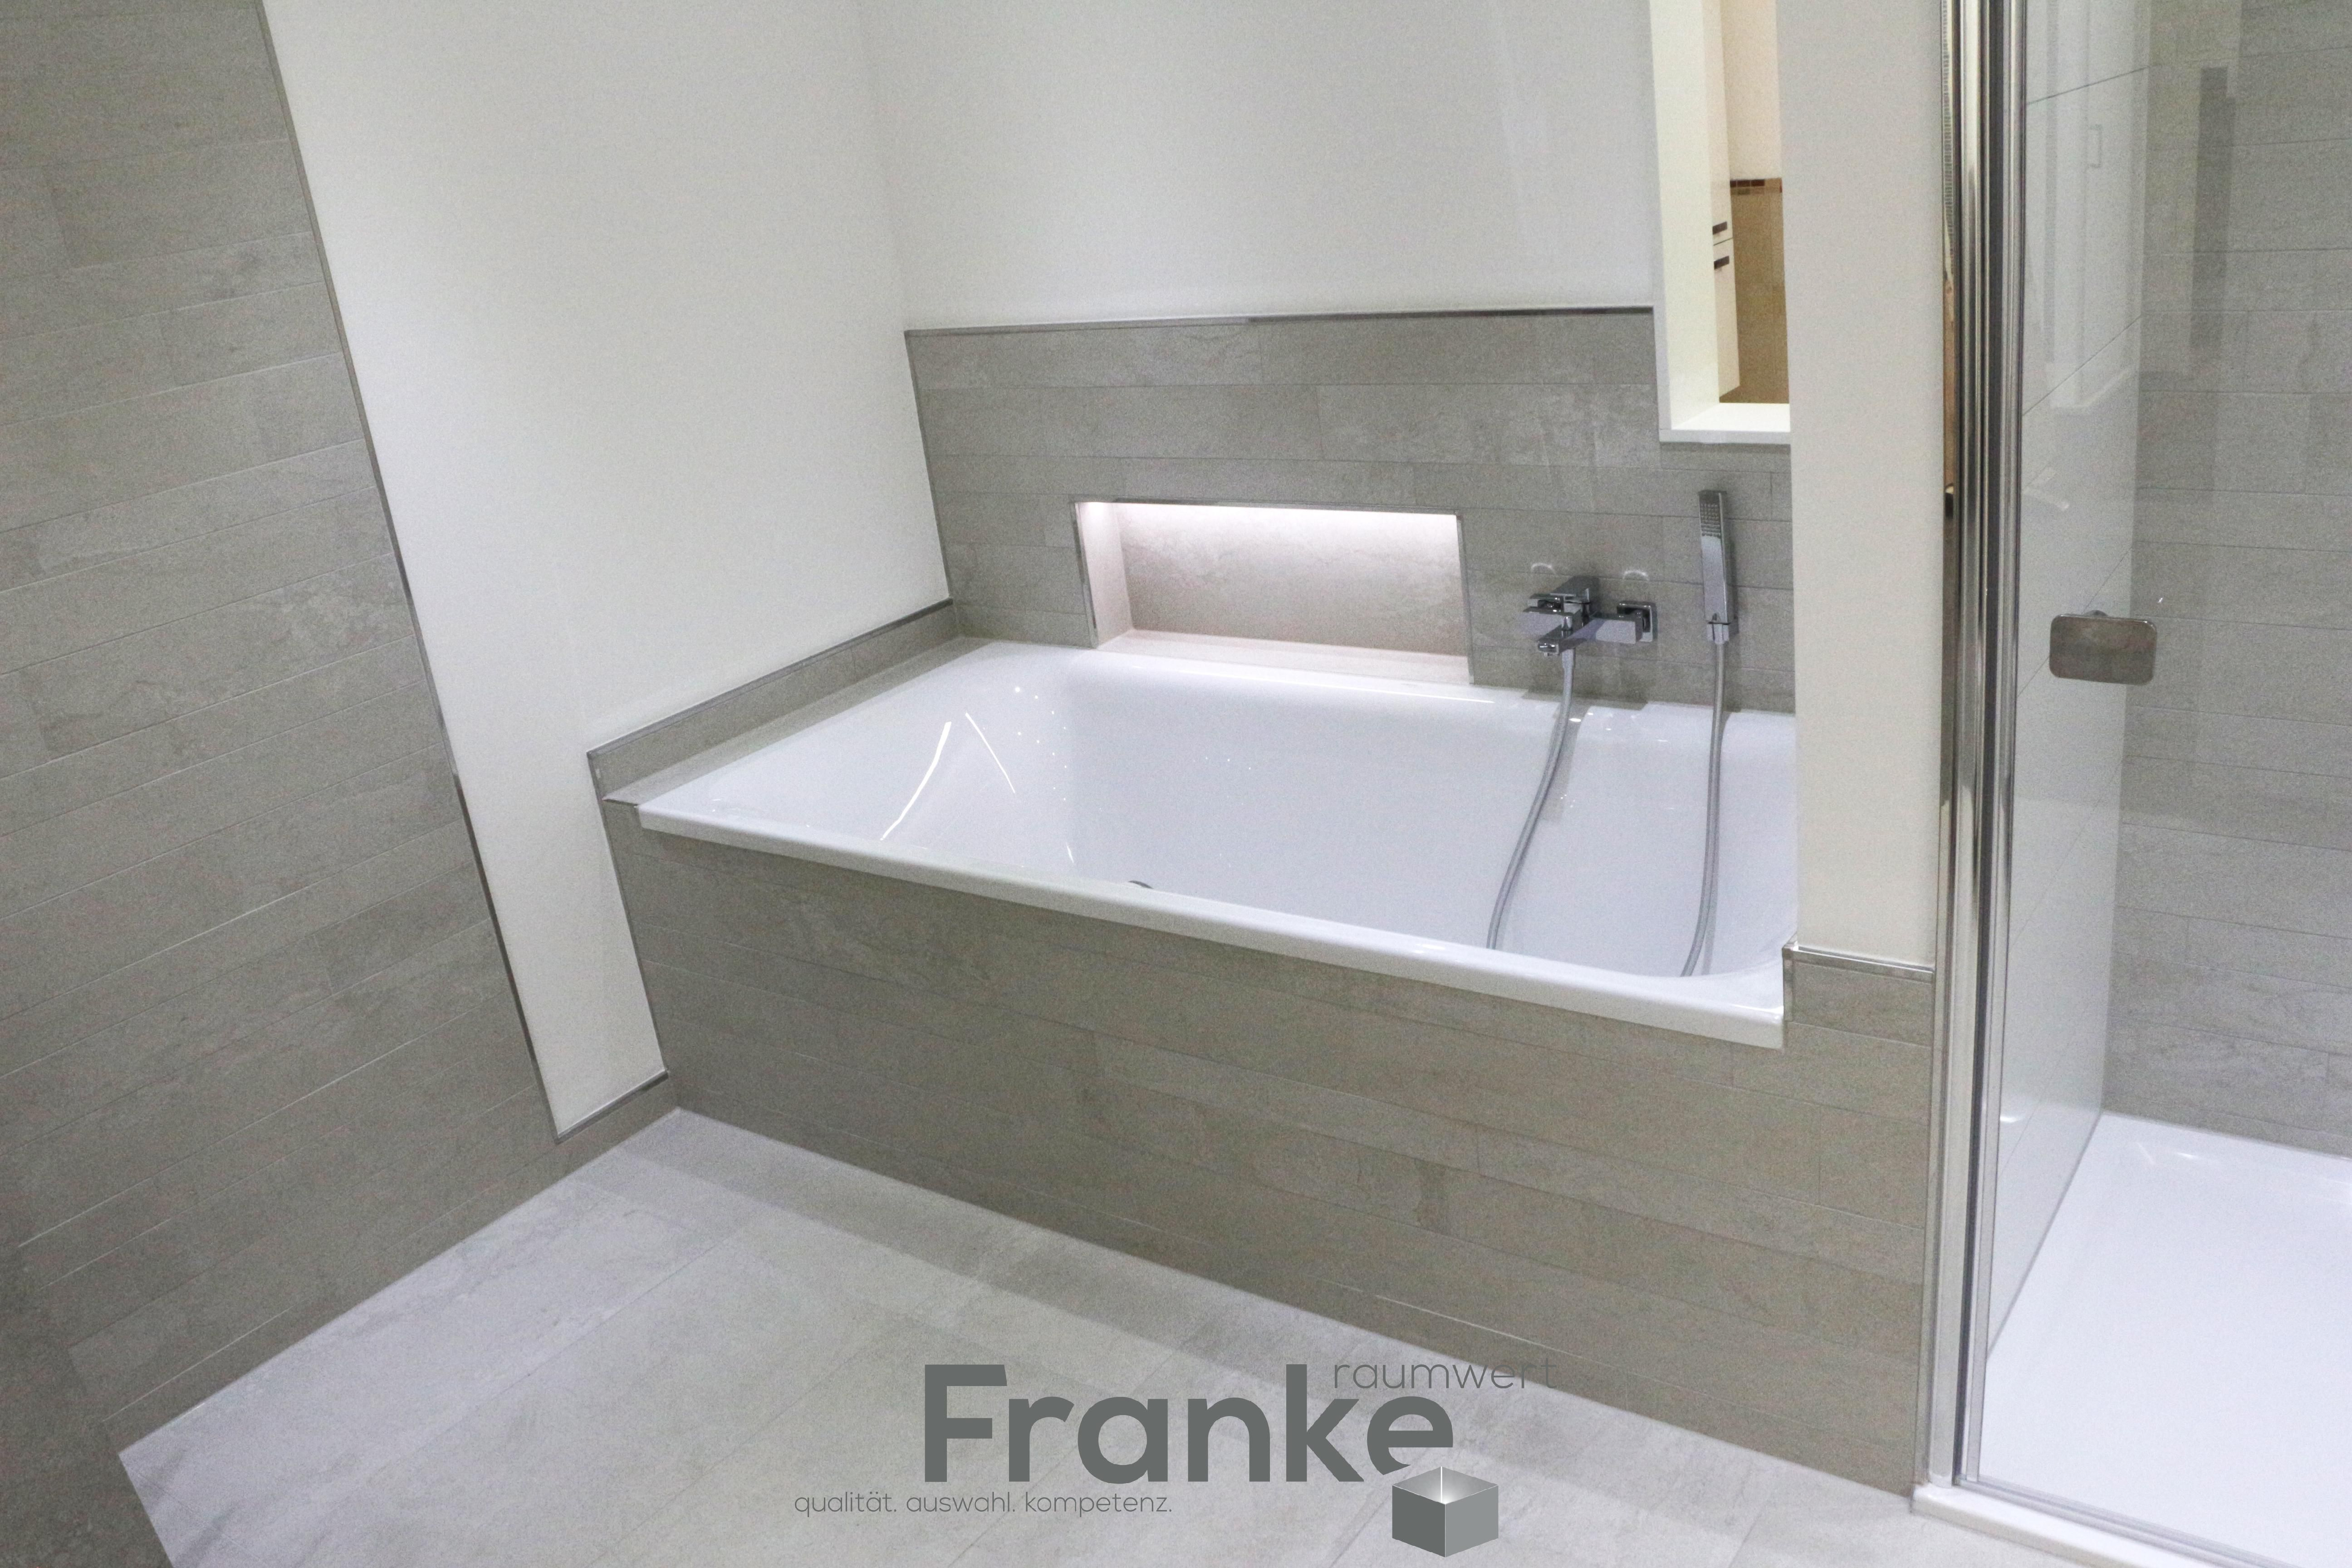 Stonemix Im Badezimmer Badezimmer Badezimmer Fliesen Badezimmer Innenausstattung